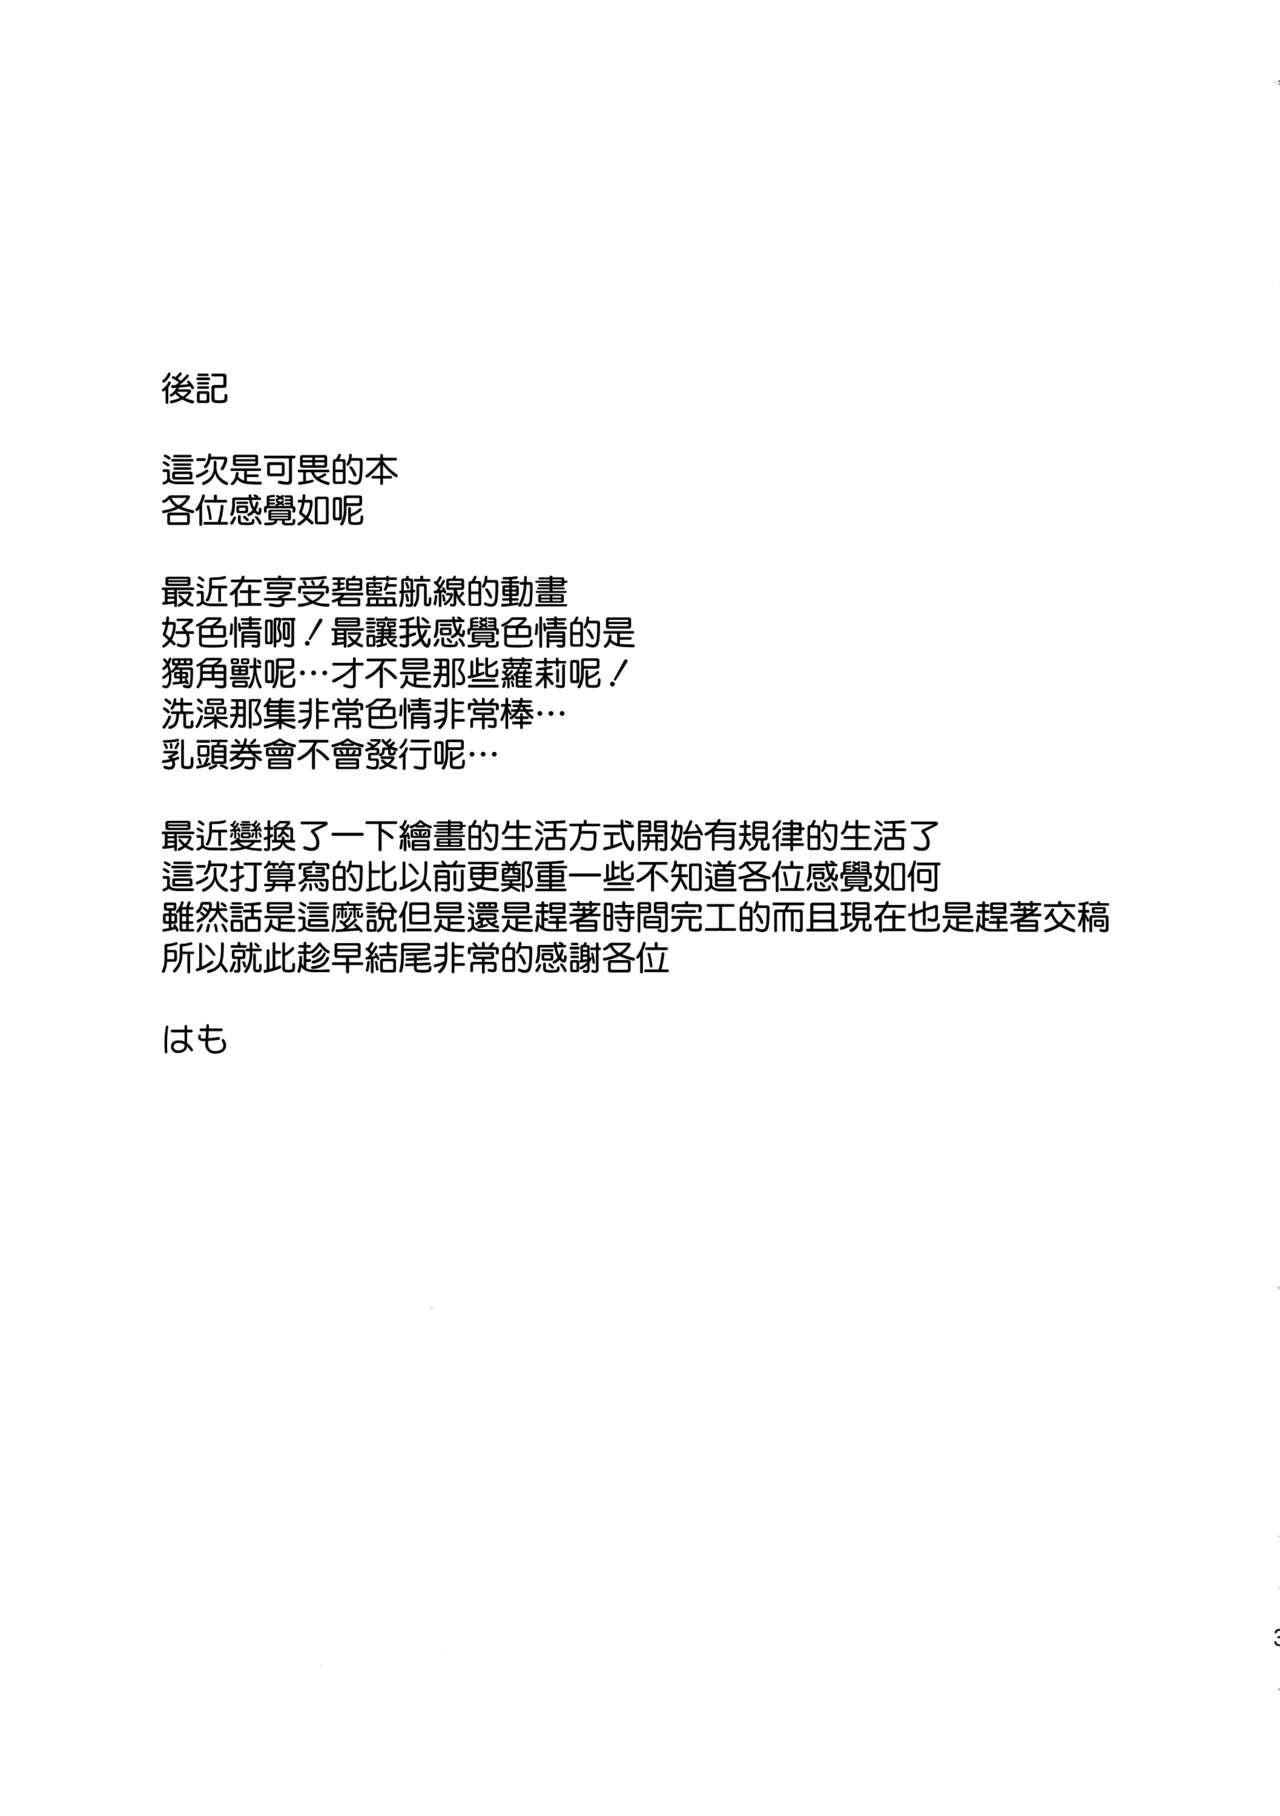 Formidable no Oppai ga Momitakute Shikataganai 32